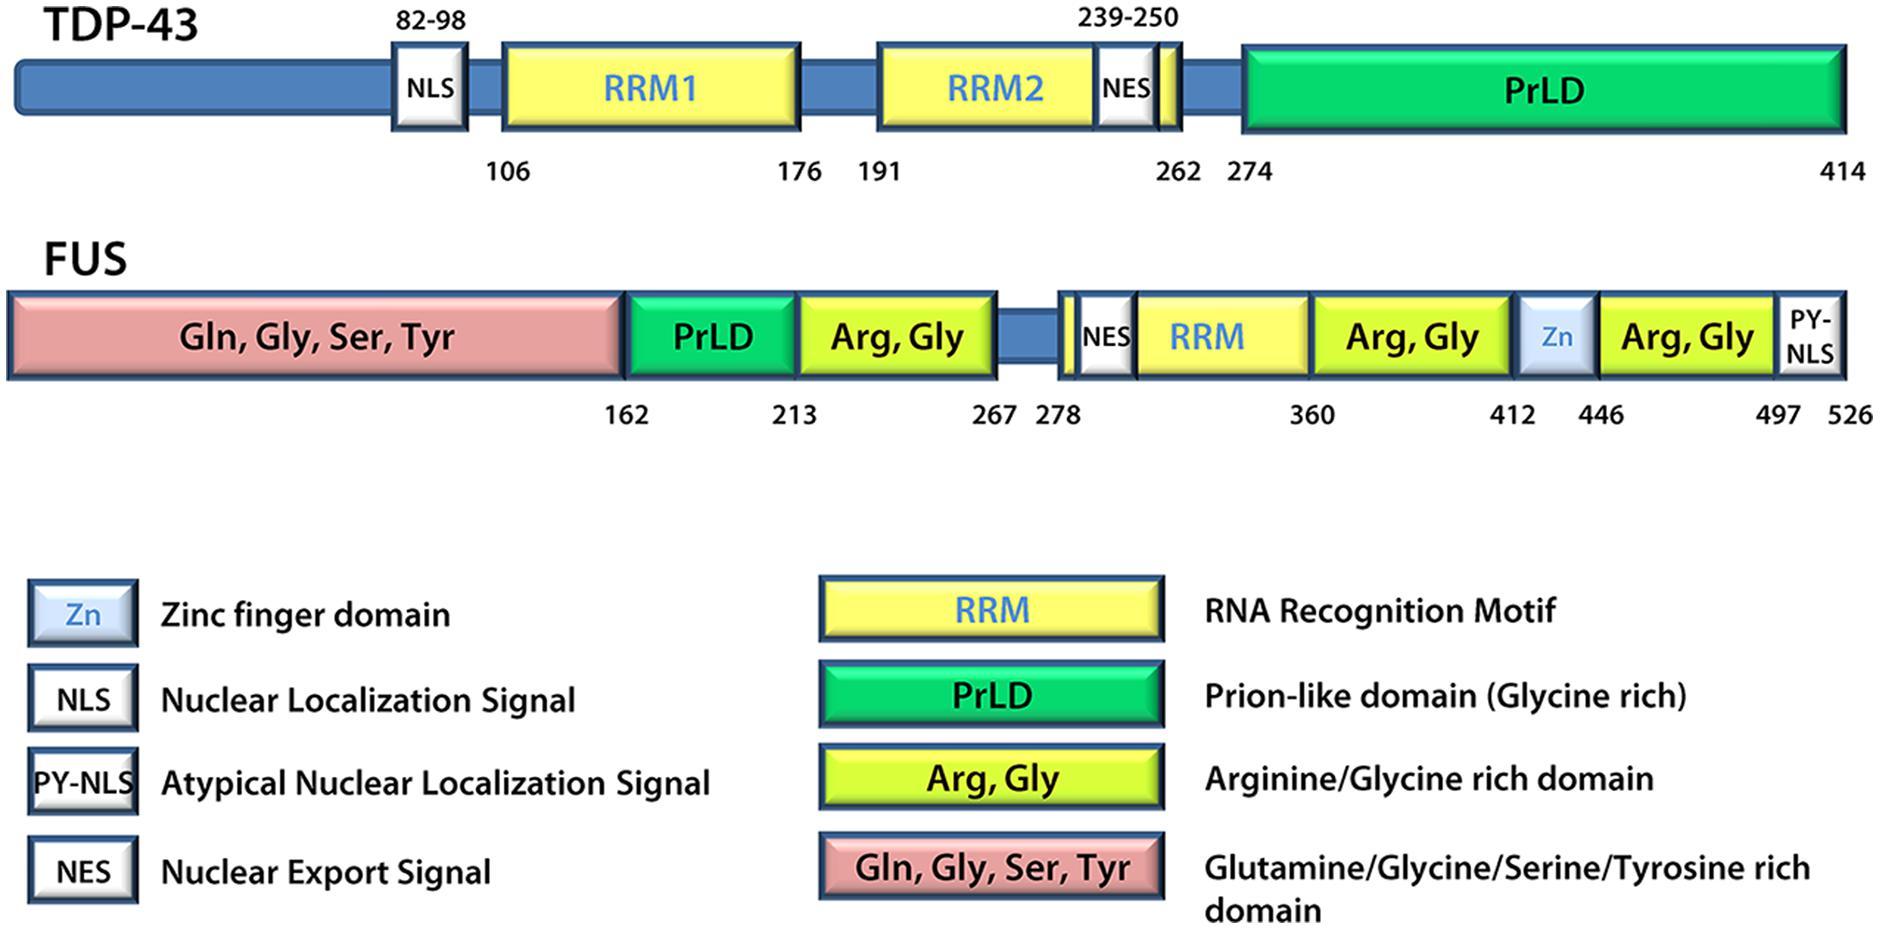 Signal Response* Signal Response II - The Signal